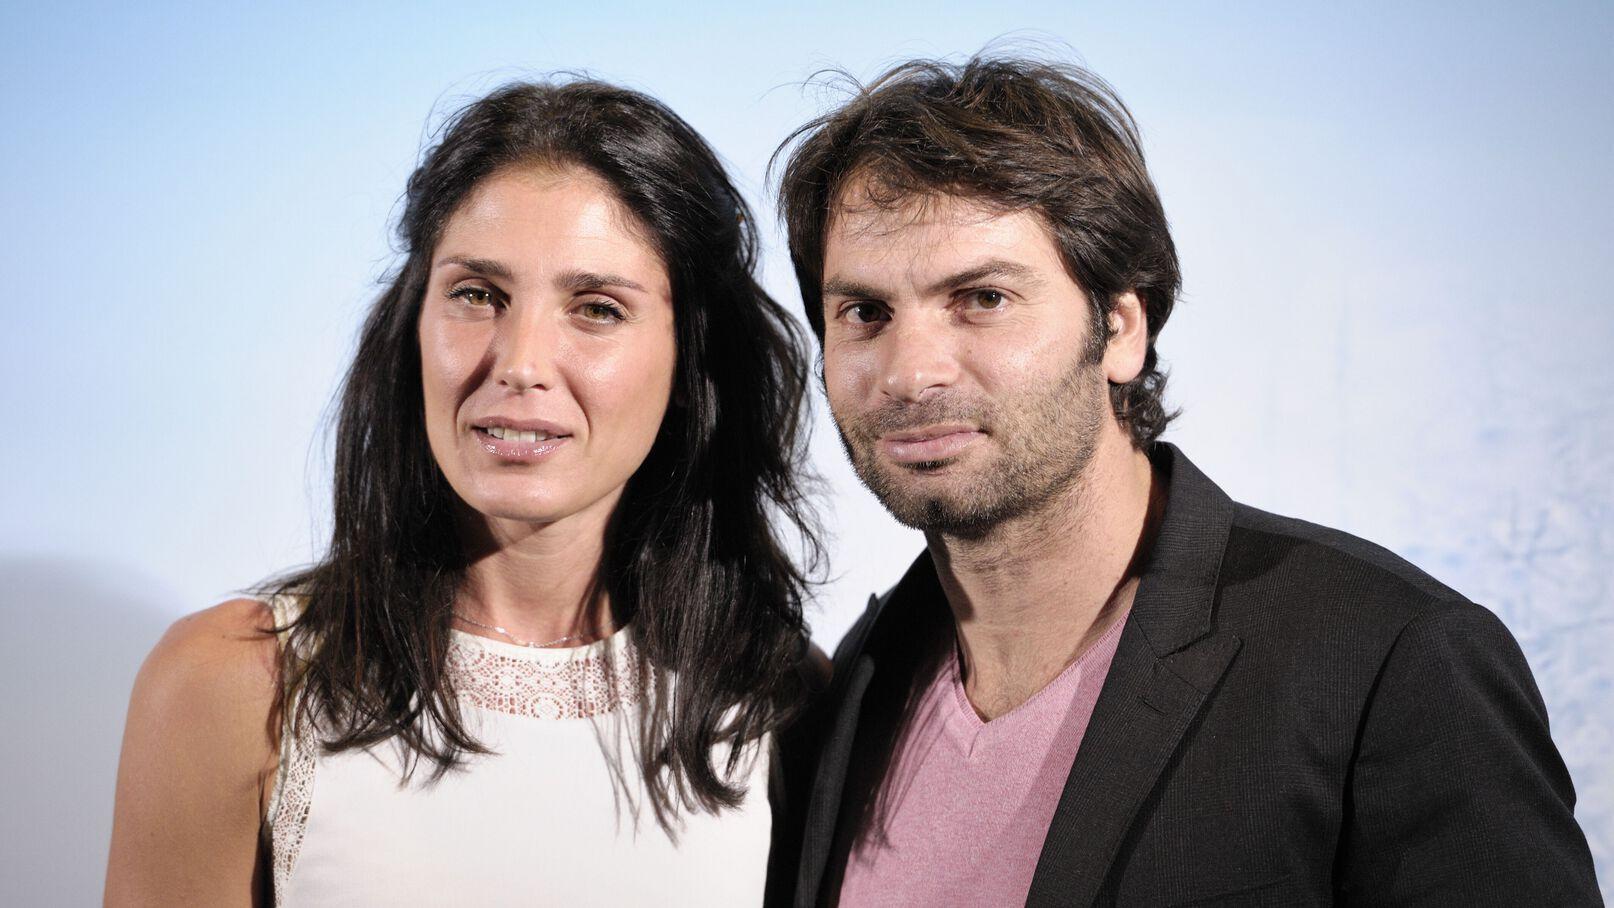 Loretta et Christophe Dominici @KCS Presse